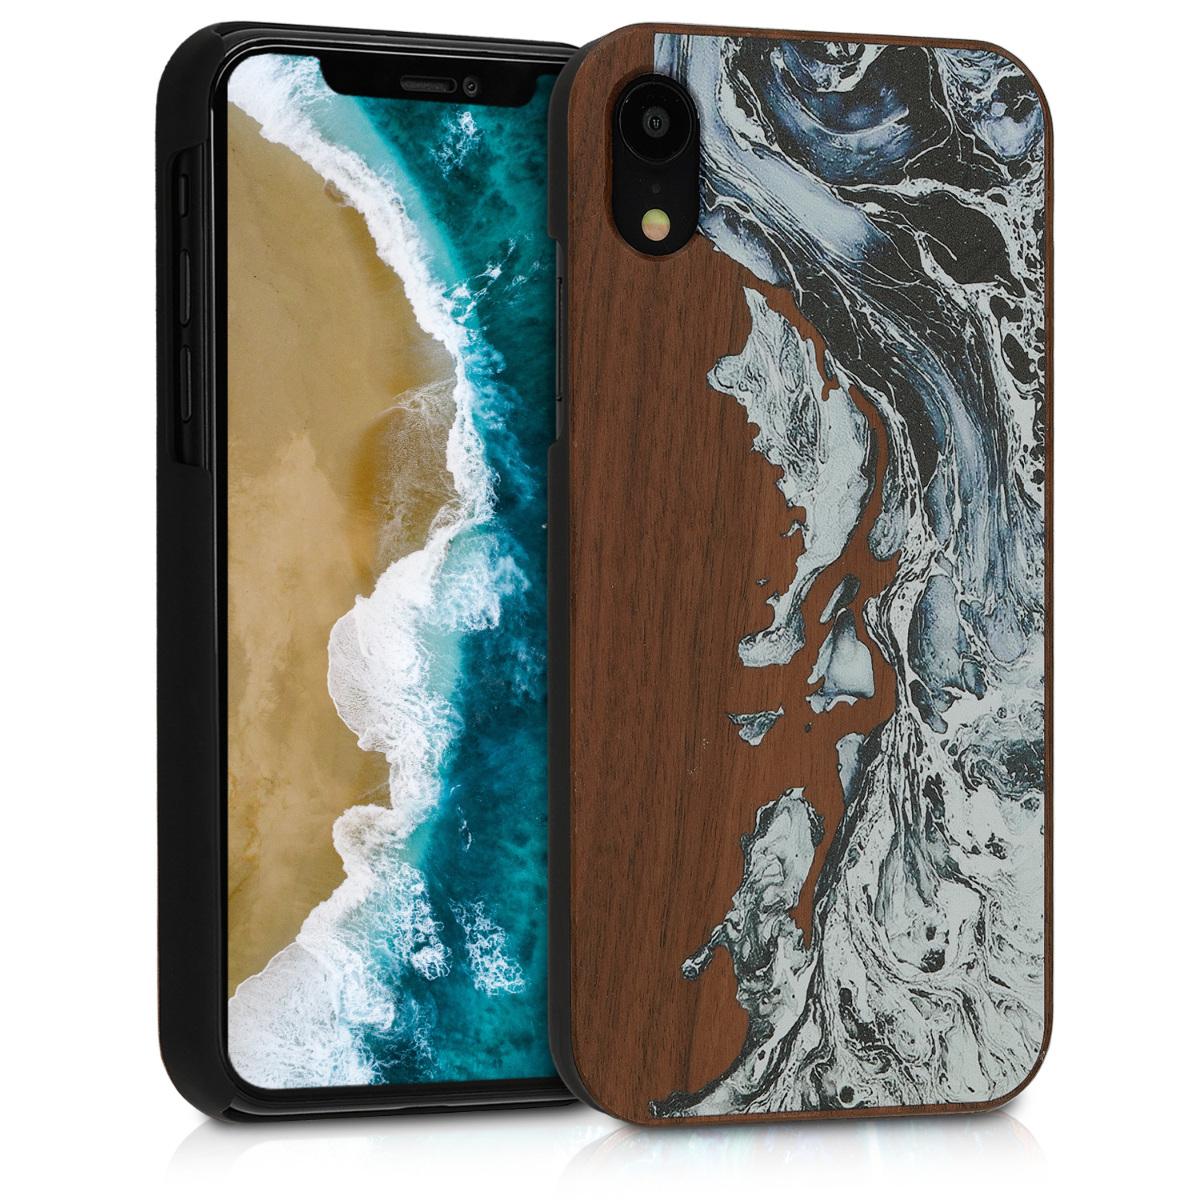 Dřevěné pouzdro pro Apple iPhone XR - Akvarel Waves White | Black | Brown